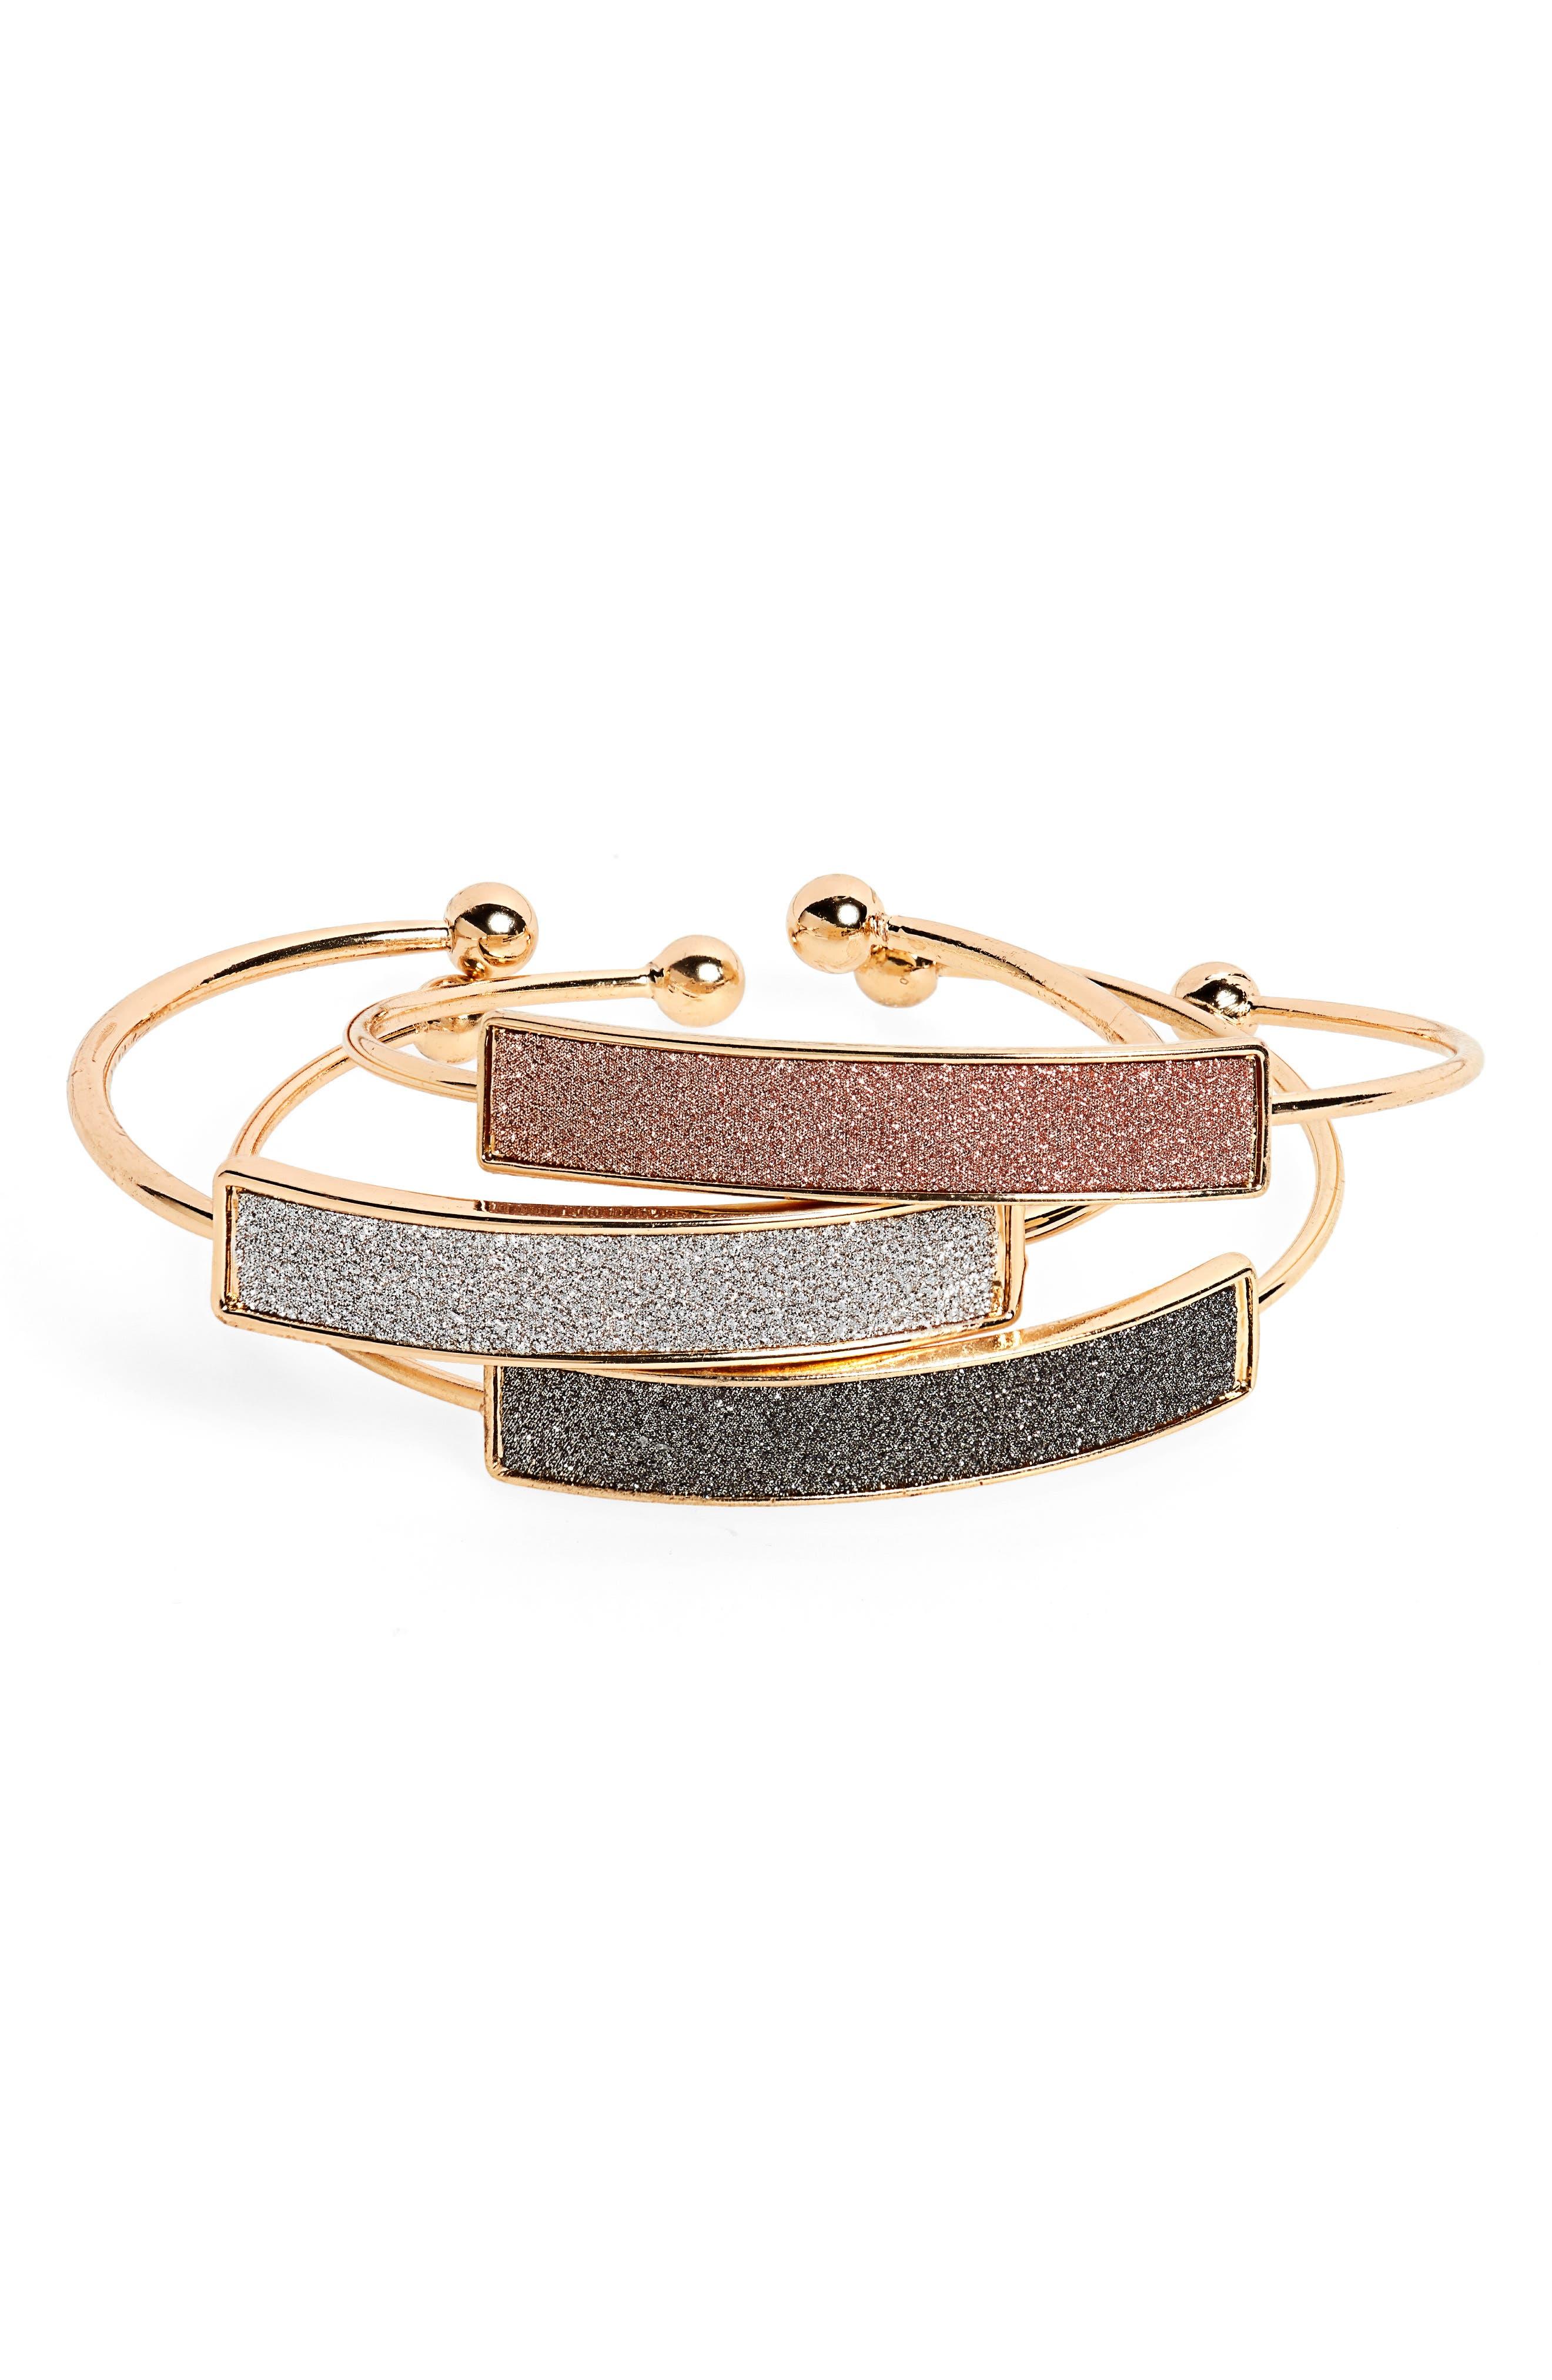 PANACEA Set Of 3 Cuff Bracelets in Gold/ Multi